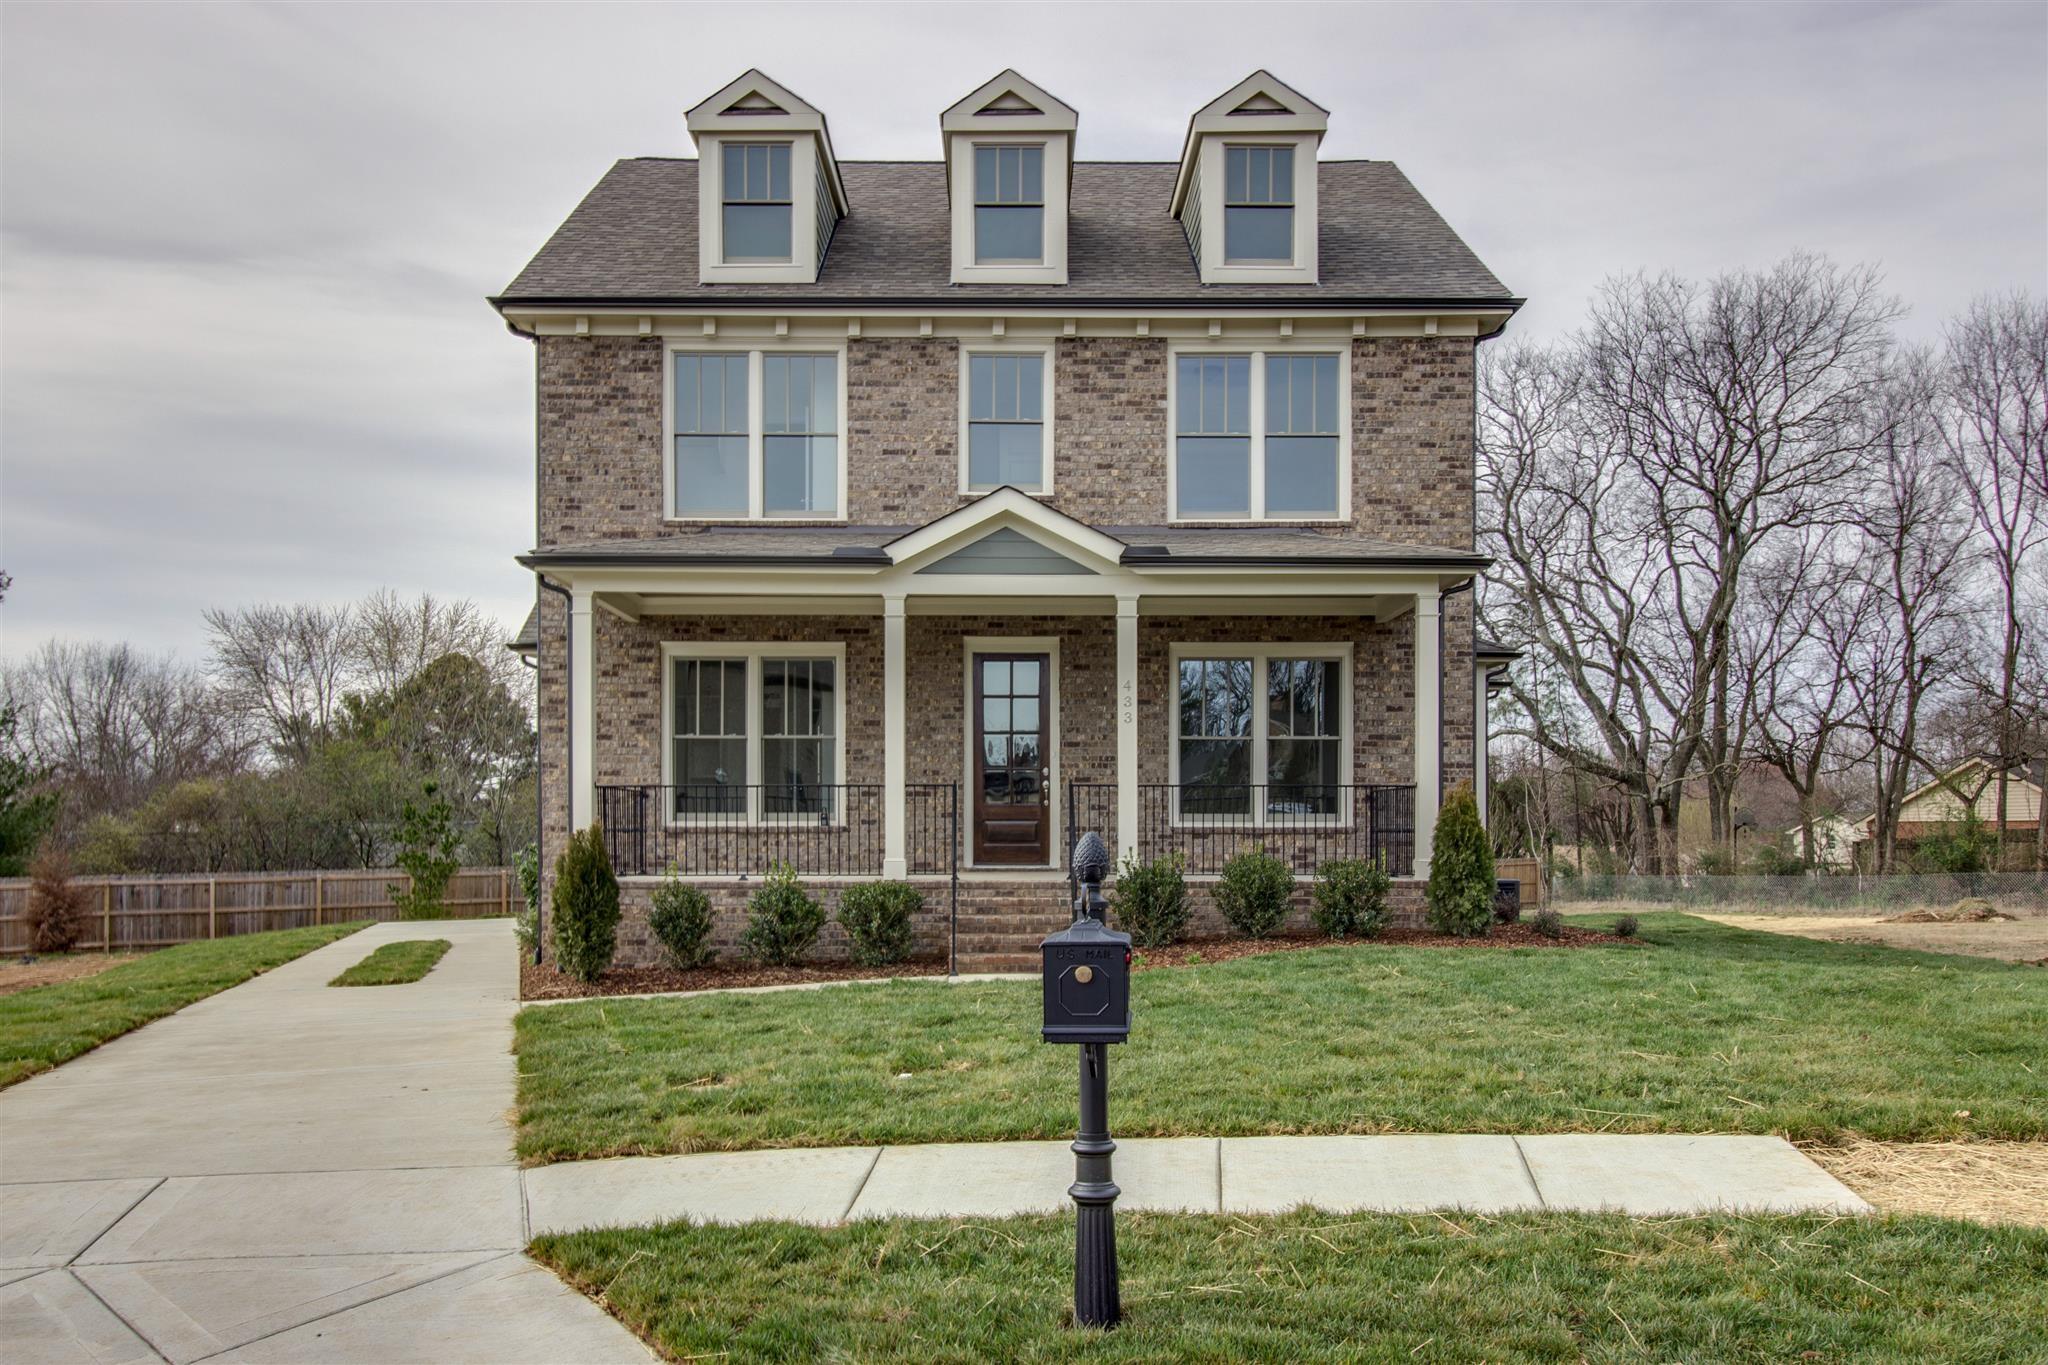 Ralston Row Subdivision Homes For Sale Franklin TN